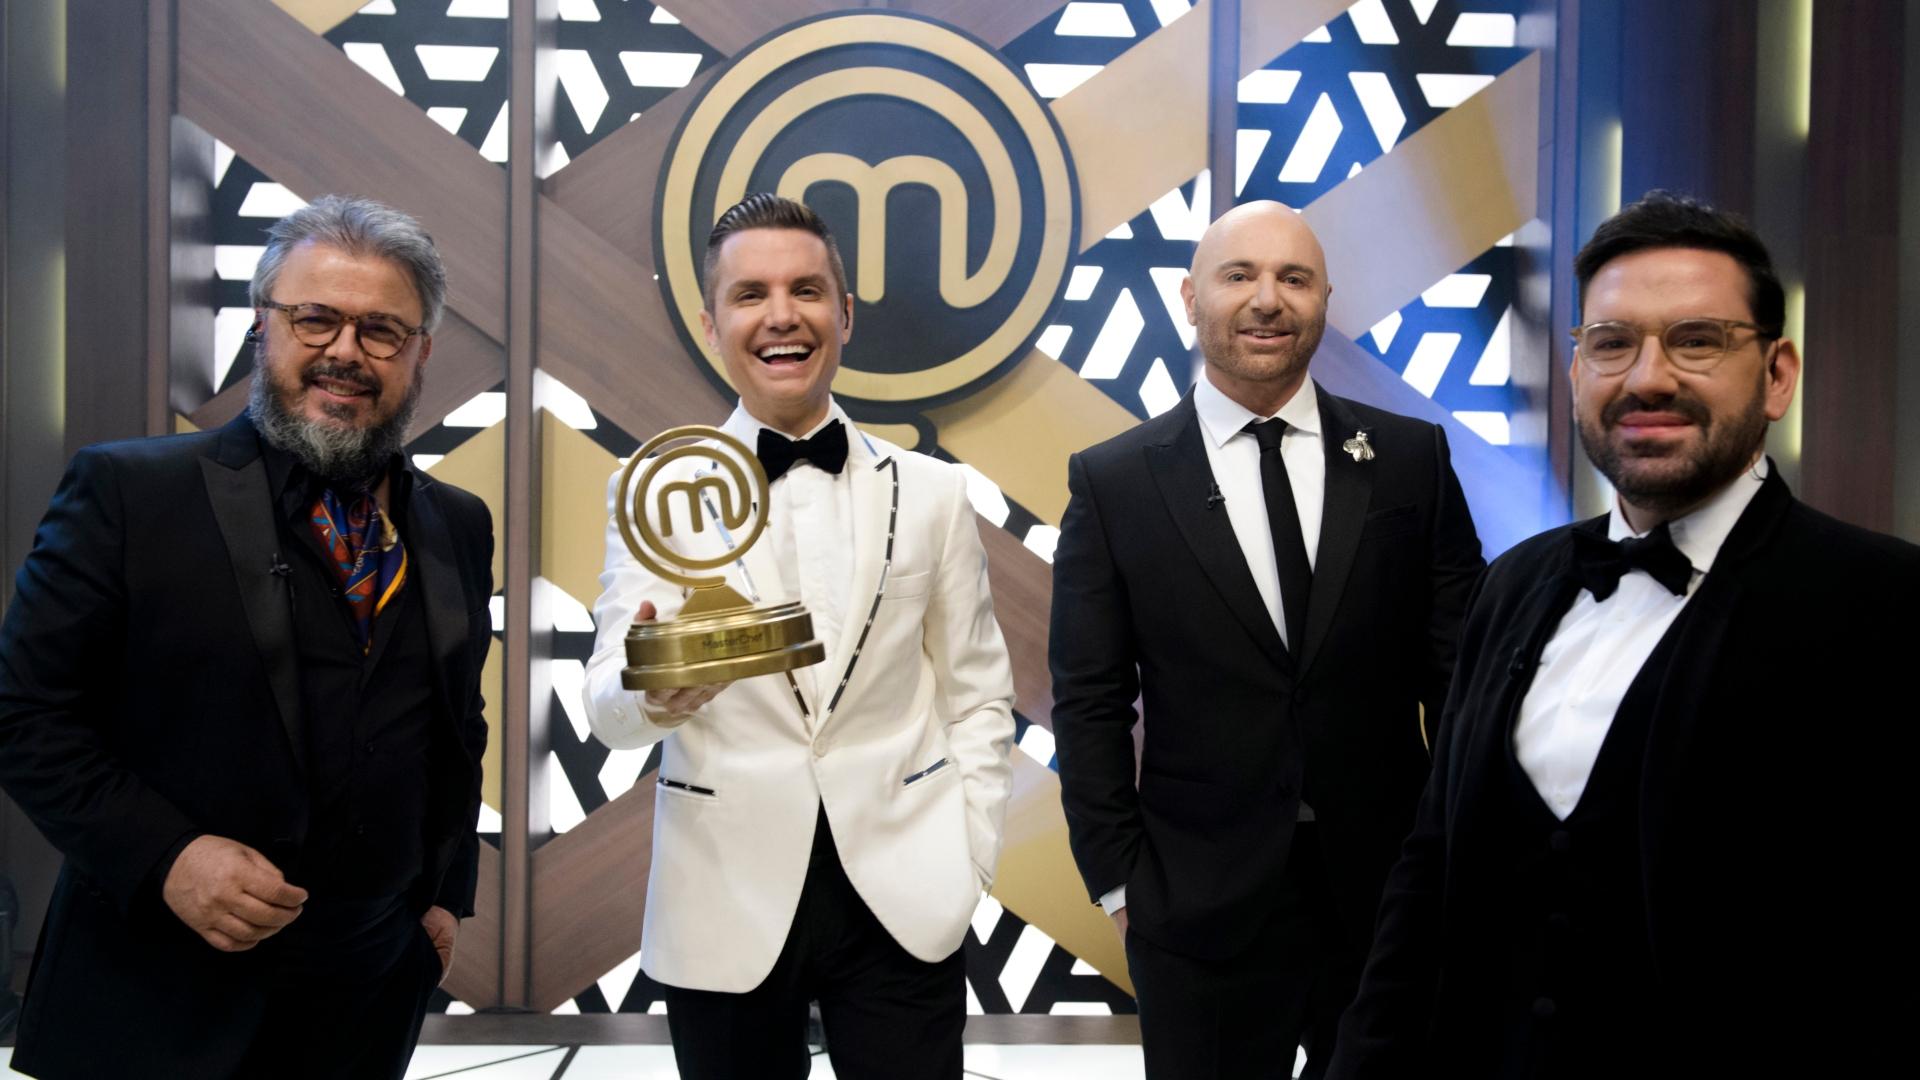 Telefe ganó abril y ya lleva 40 meses como líder de la TV argentina